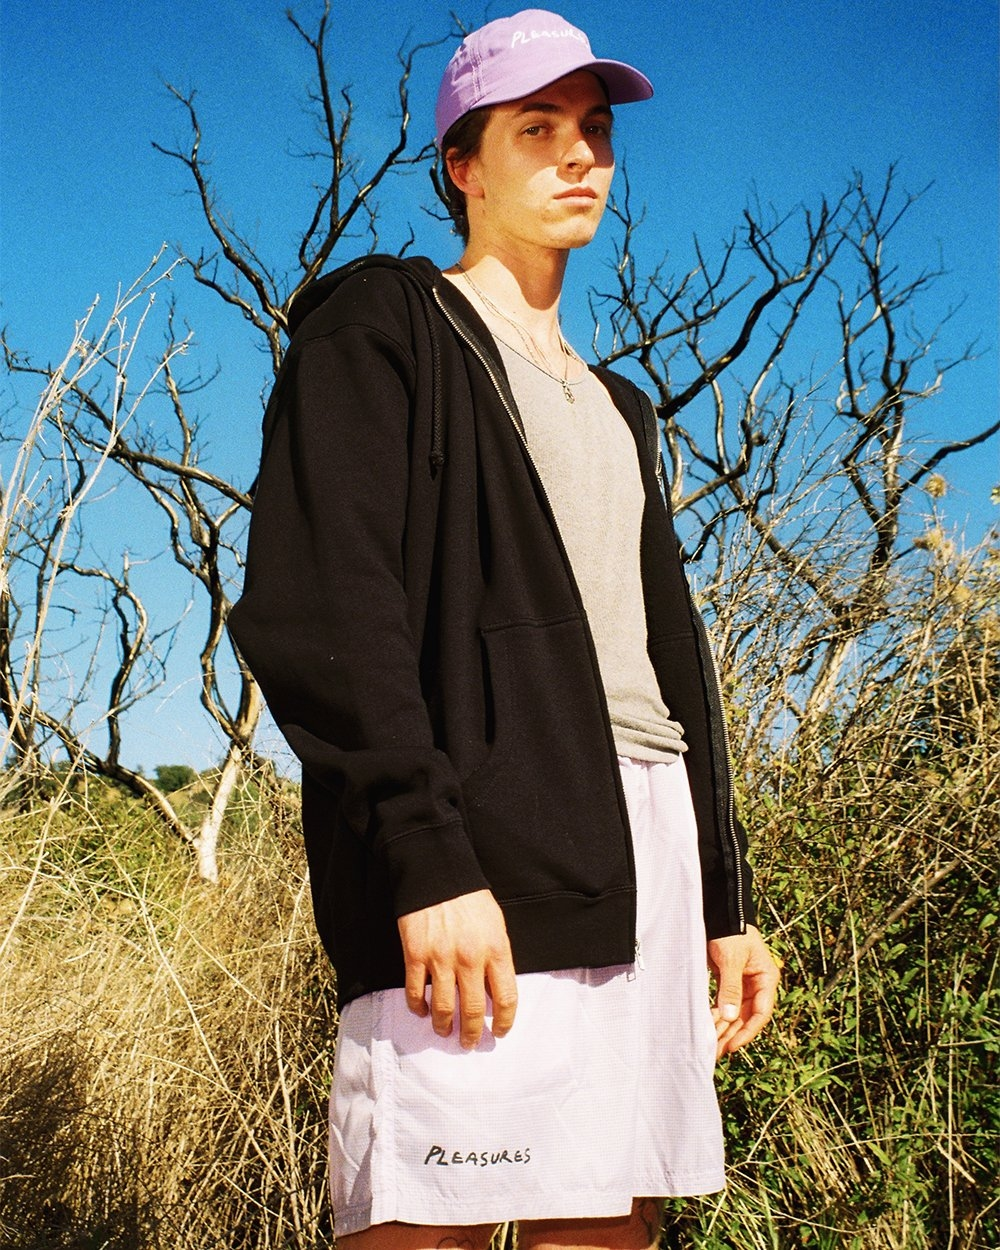 【PLEASURES/プレジャーズ】HUMP NYLON SPORT CAP キャップ / LAVENDER